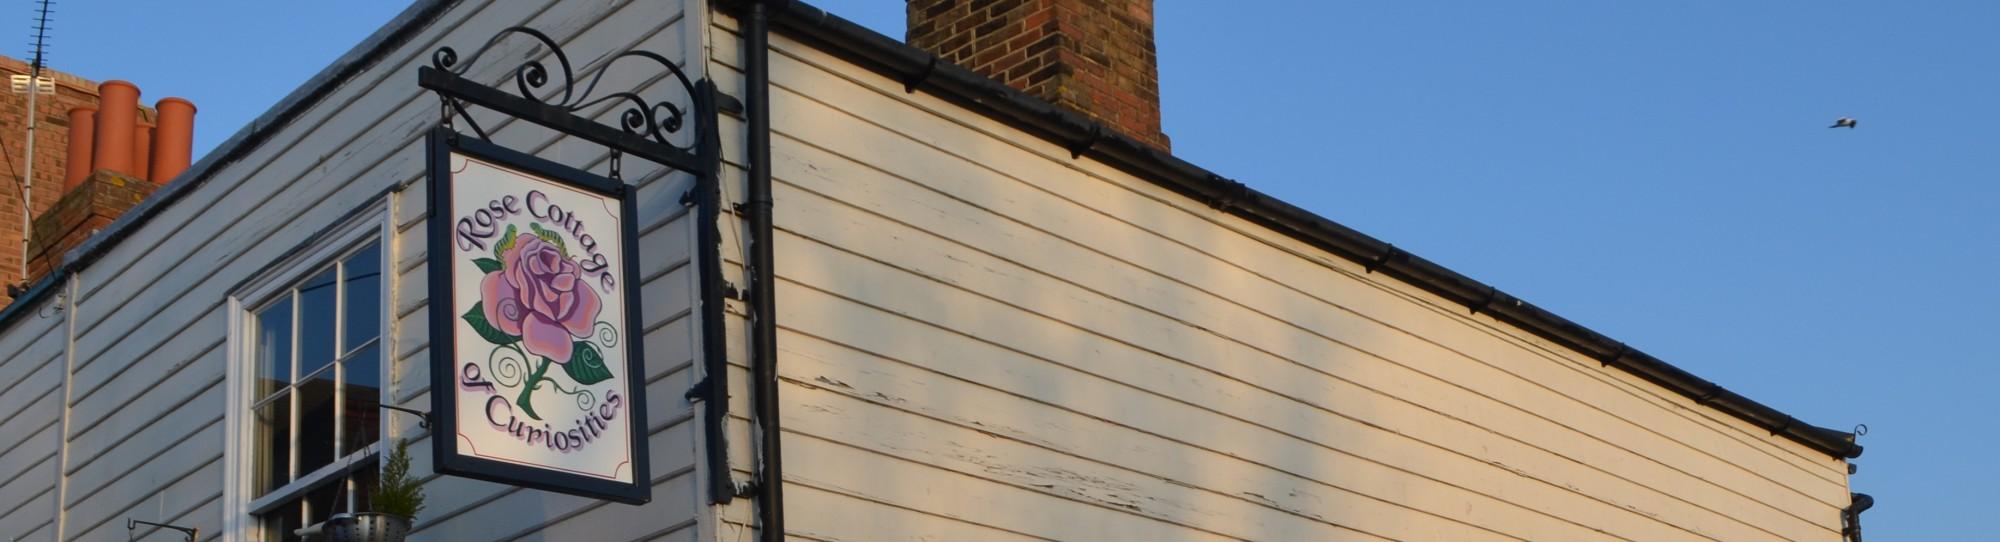 Rose Street Cottage of Curiosities